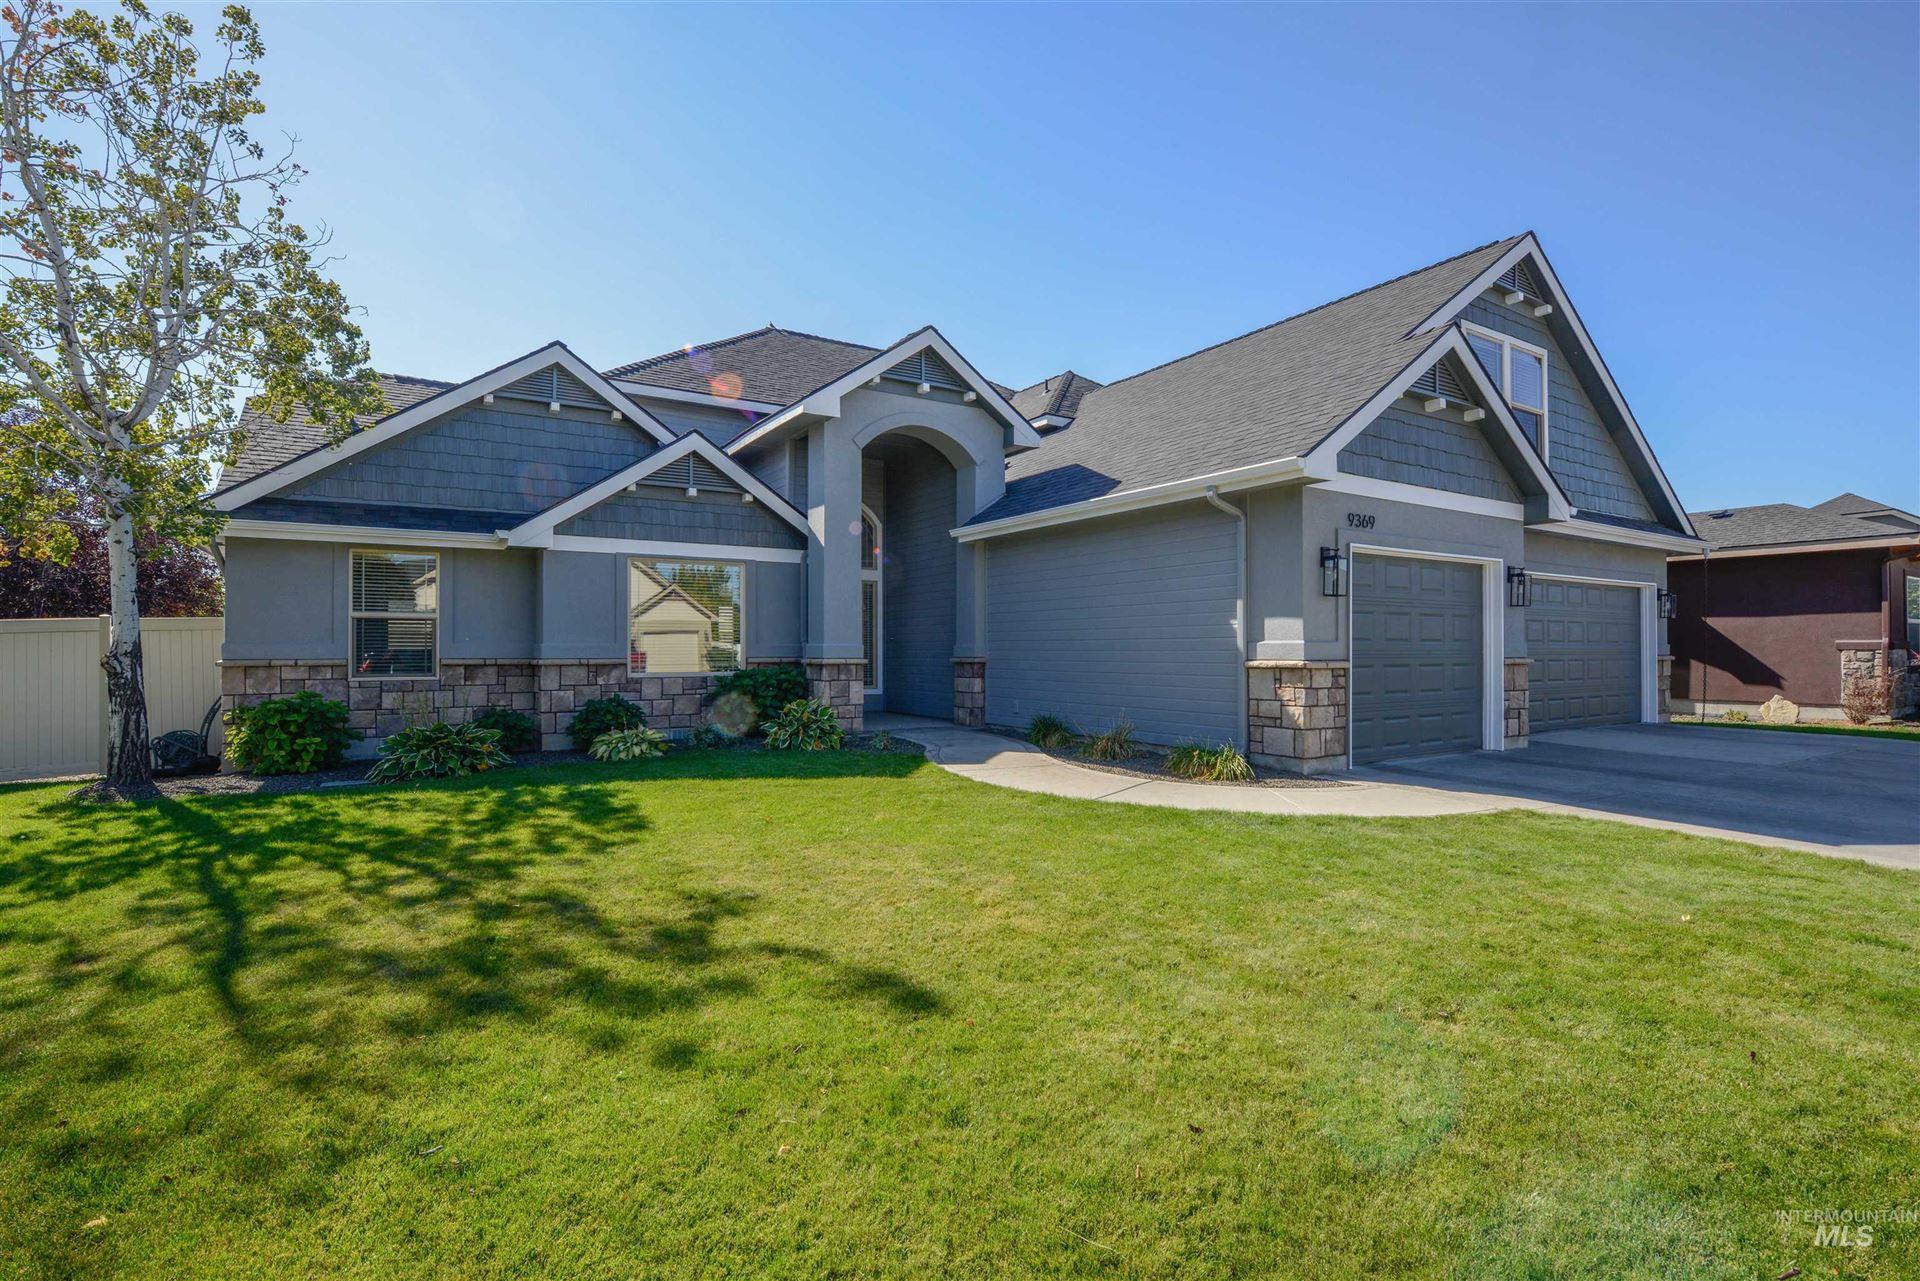 9369 W Avalanche, Boise, ID 83709 - MLS#: 98821170